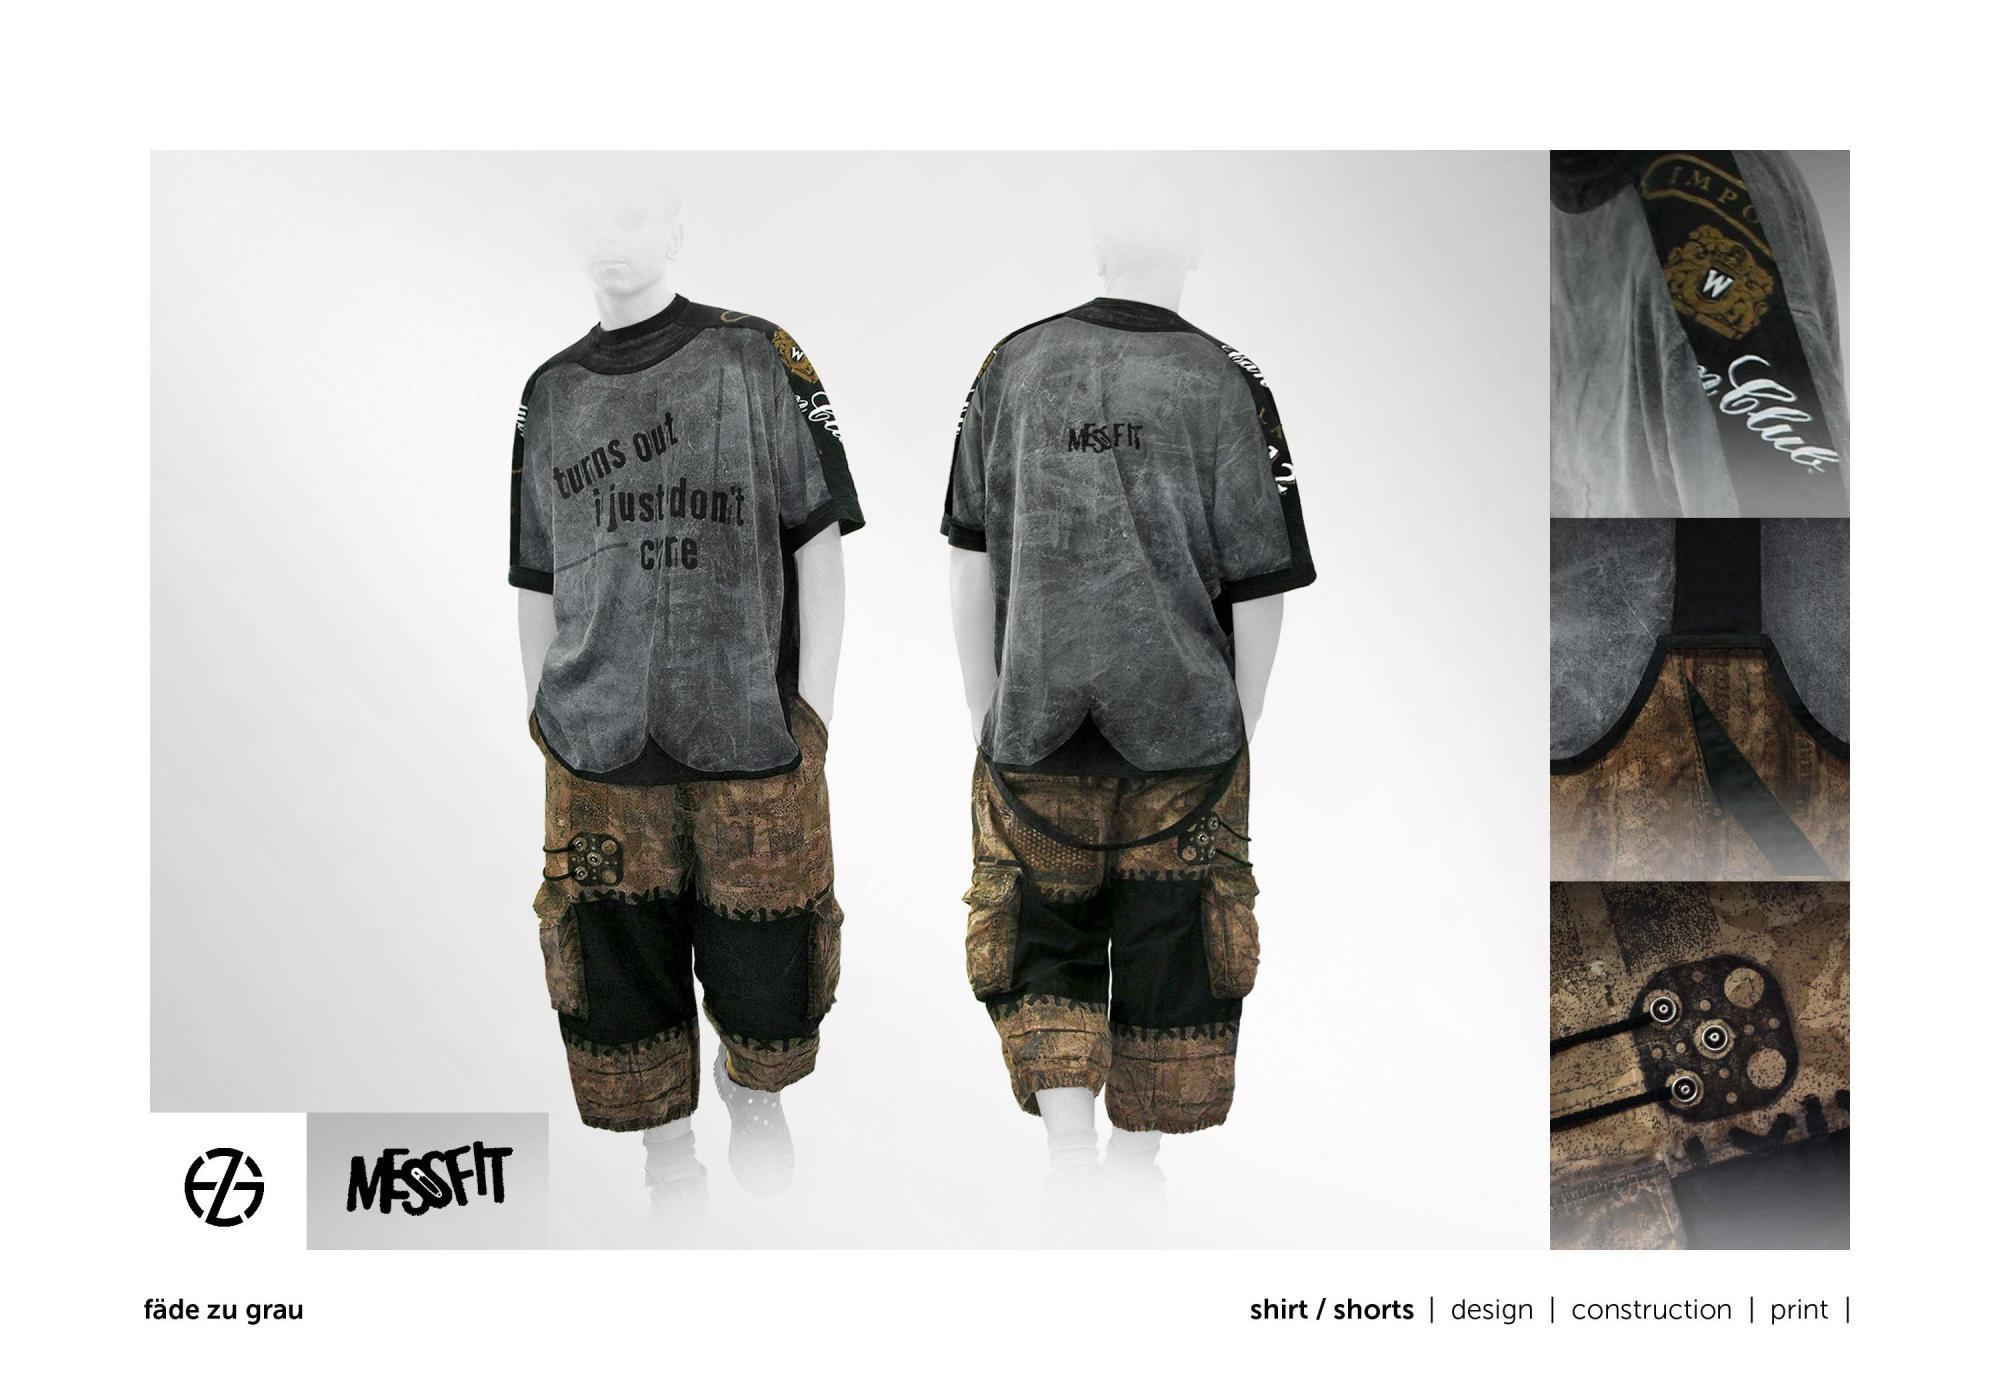 fäde zu grau | shirt, shorts